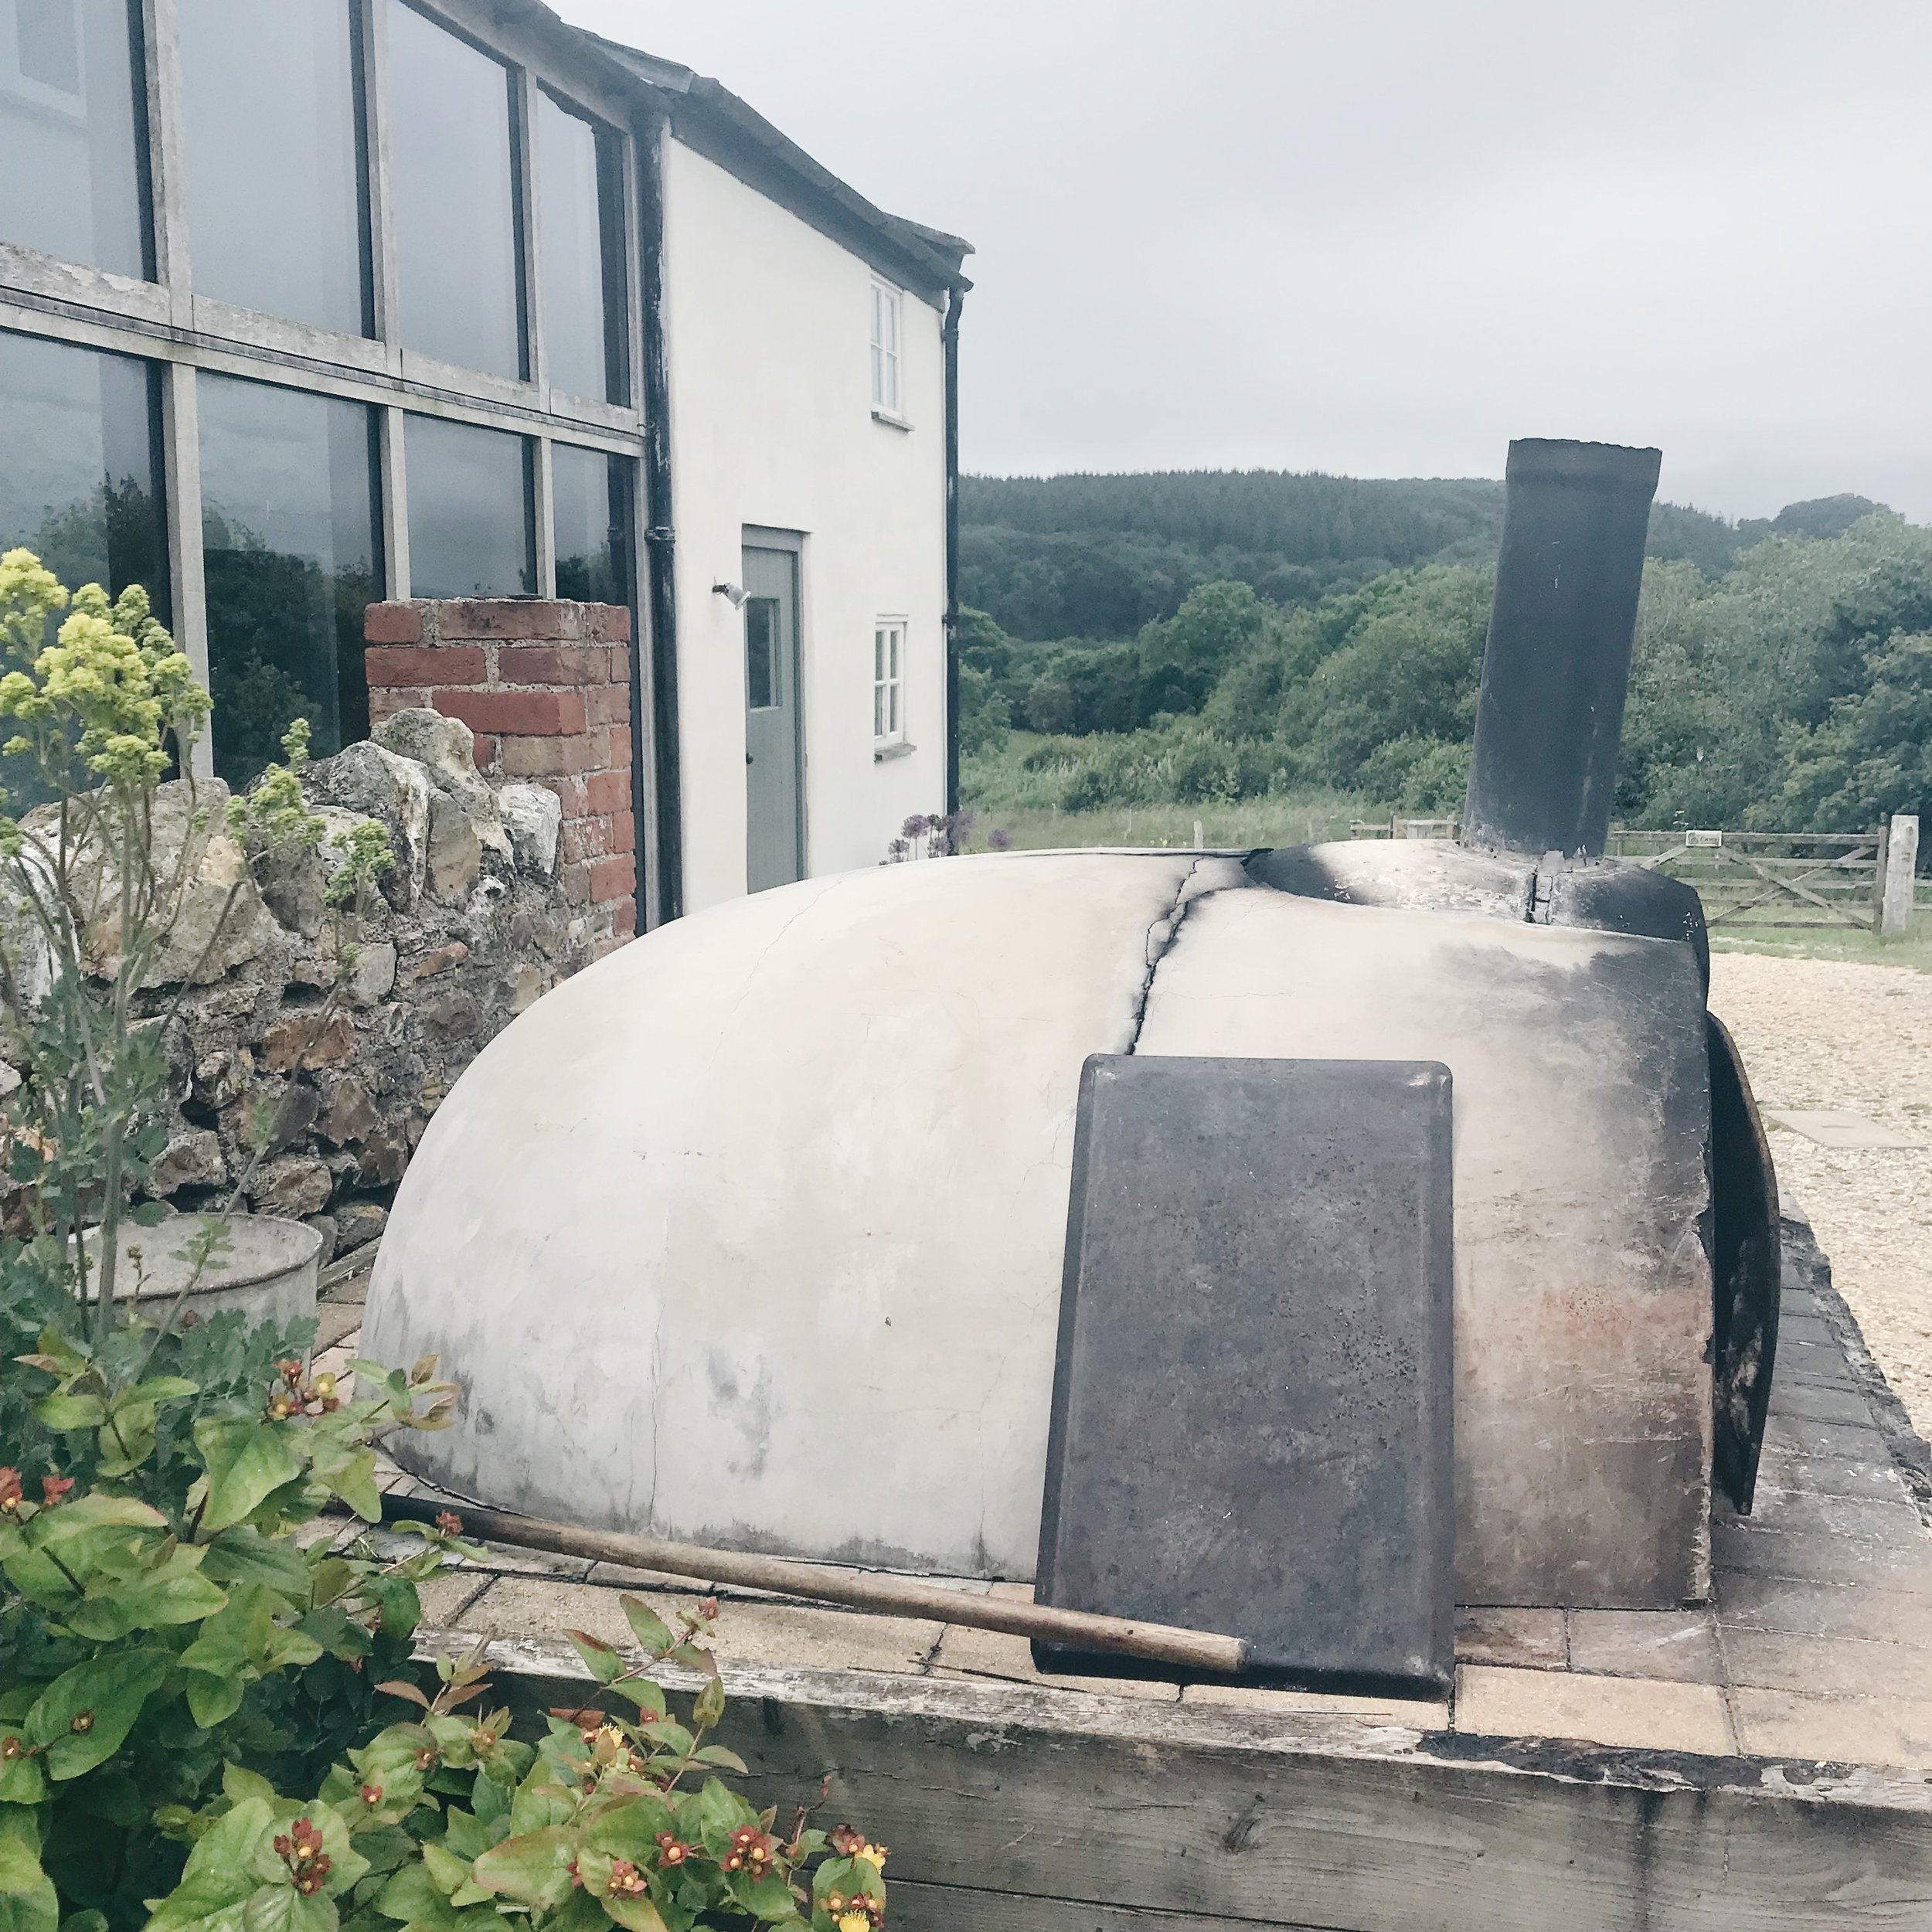 Courtyard-oven.JPG